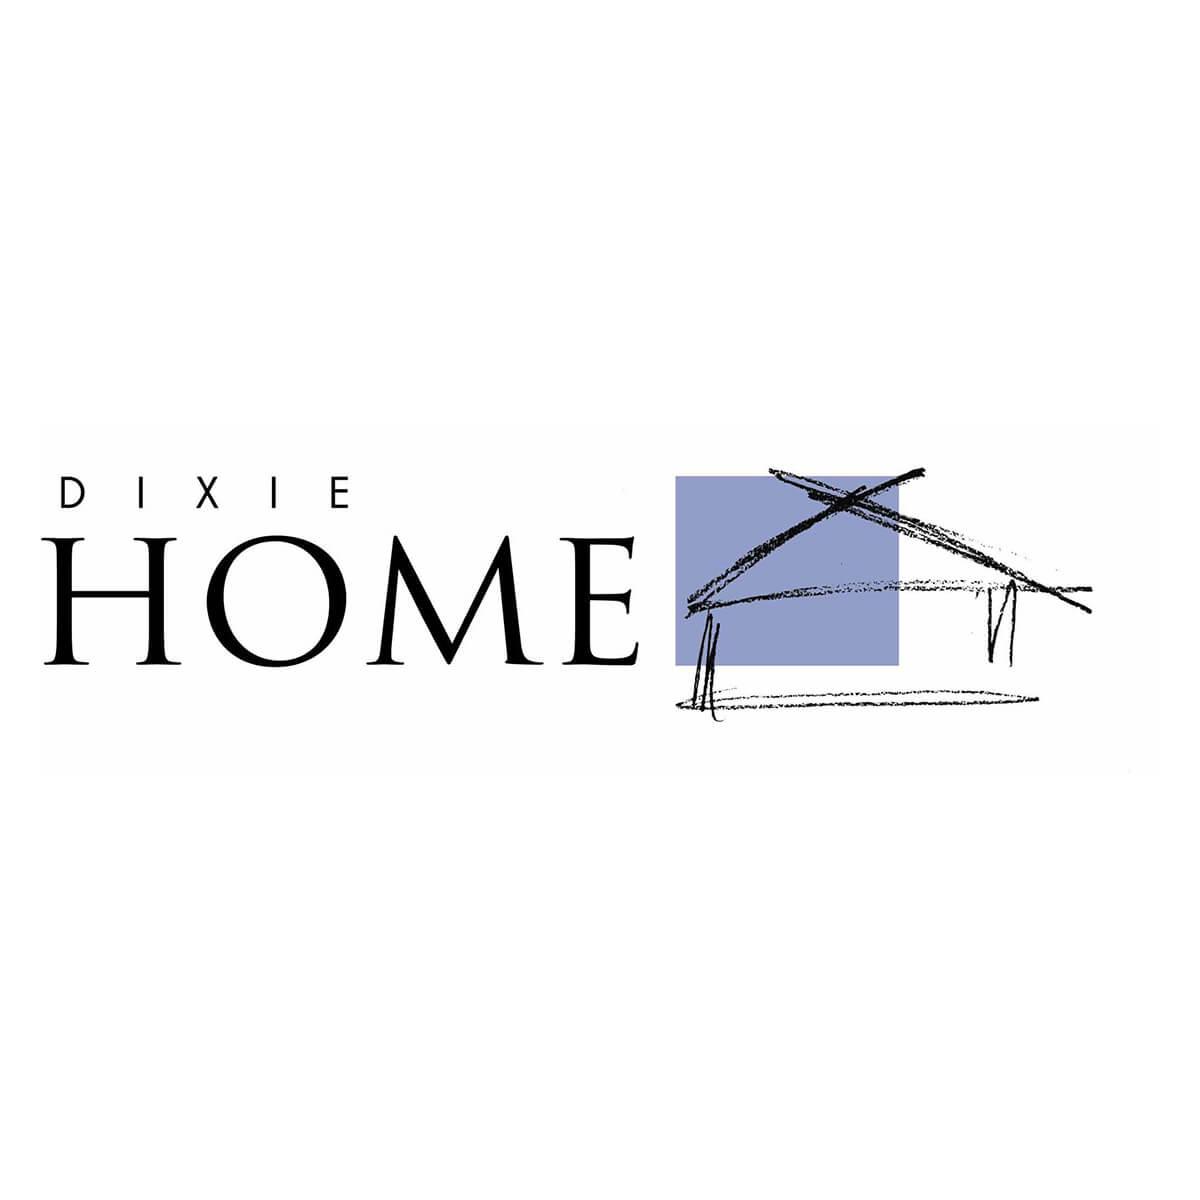 dixie-home-carpet-logo.jpg